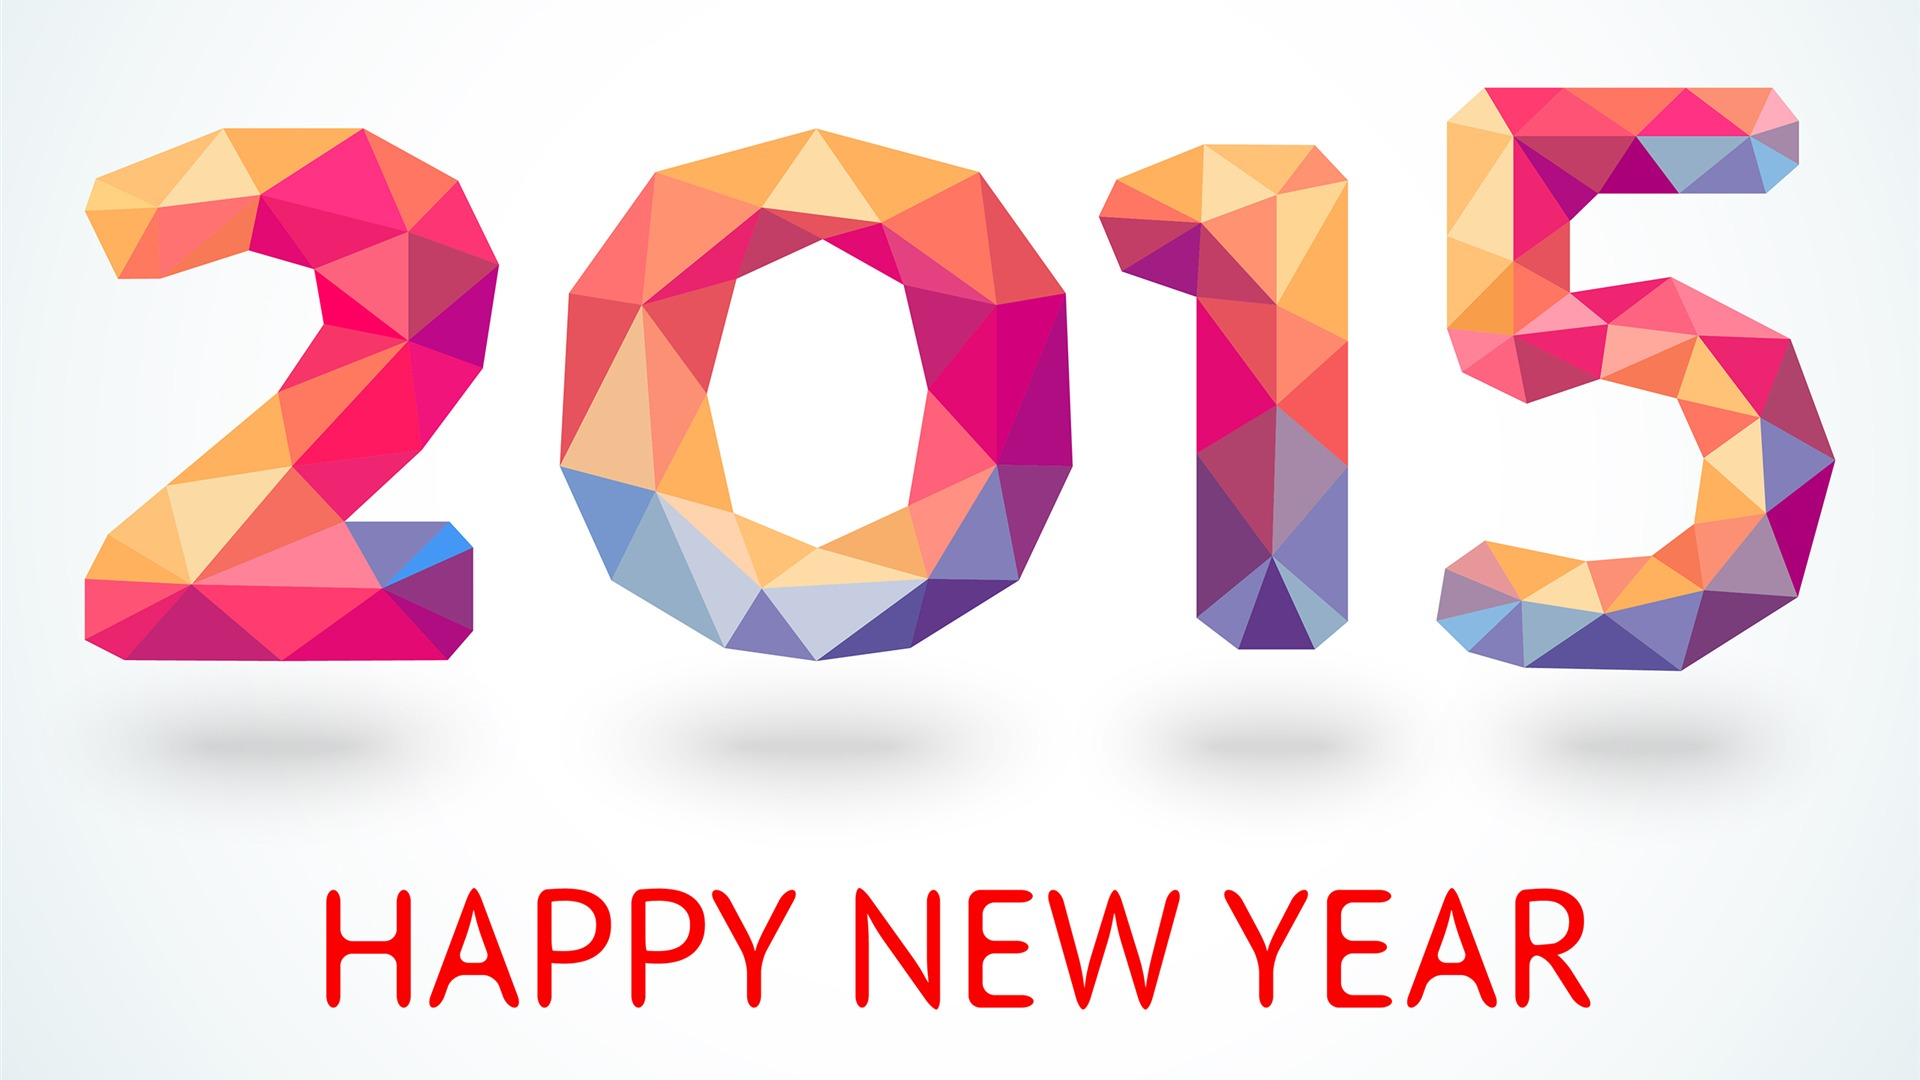 Happy_New_Year_2015_Theme_Desktop_Wallpaper_1920x1080.jpg